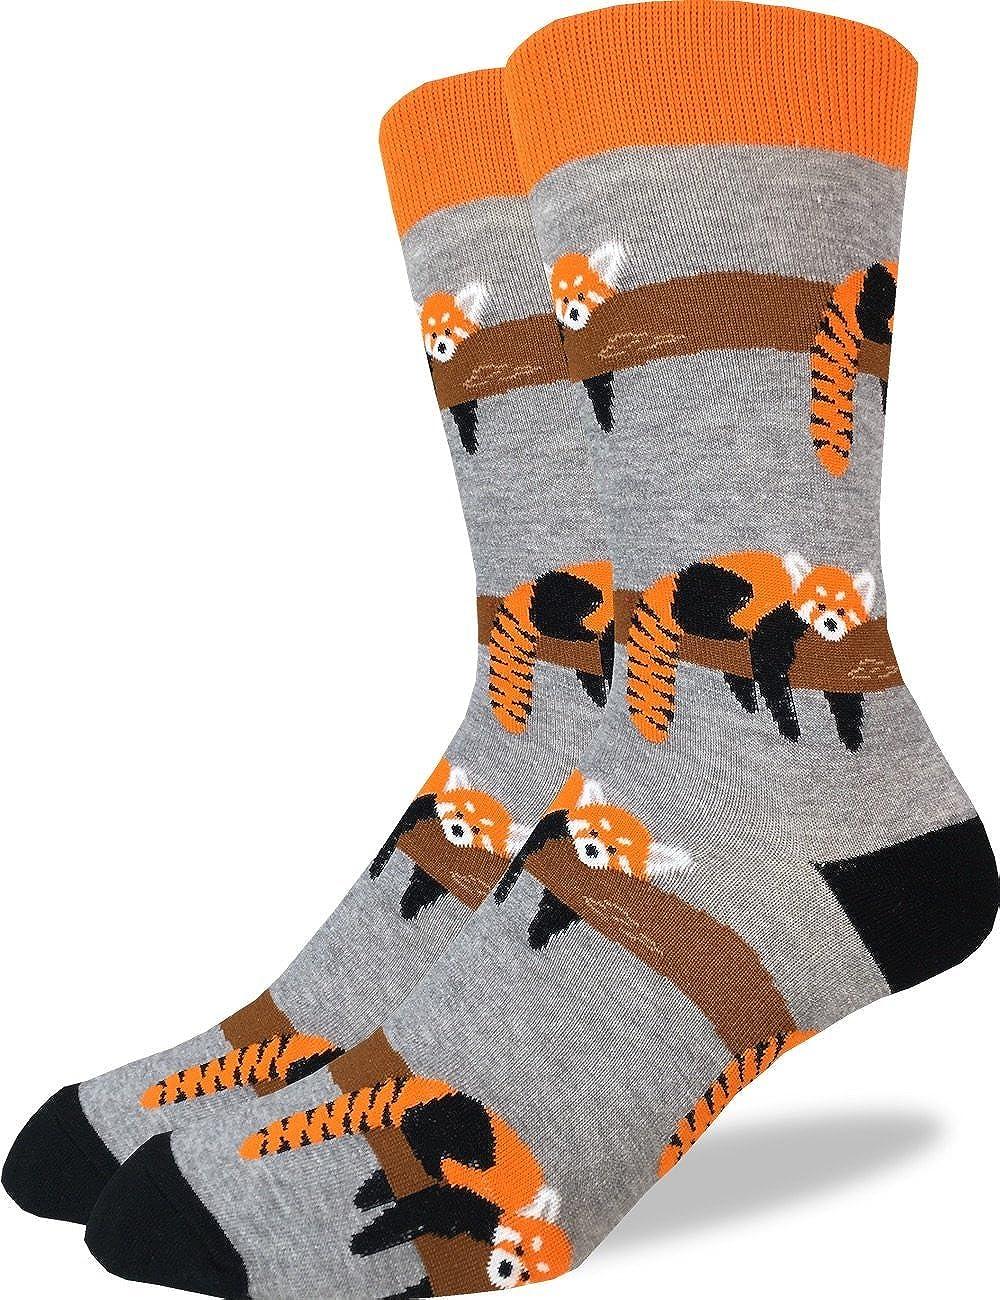 Good Luck Sock Men's Red Panda Crew Socks - Grey, Adult Shoe Size 7-12 1290